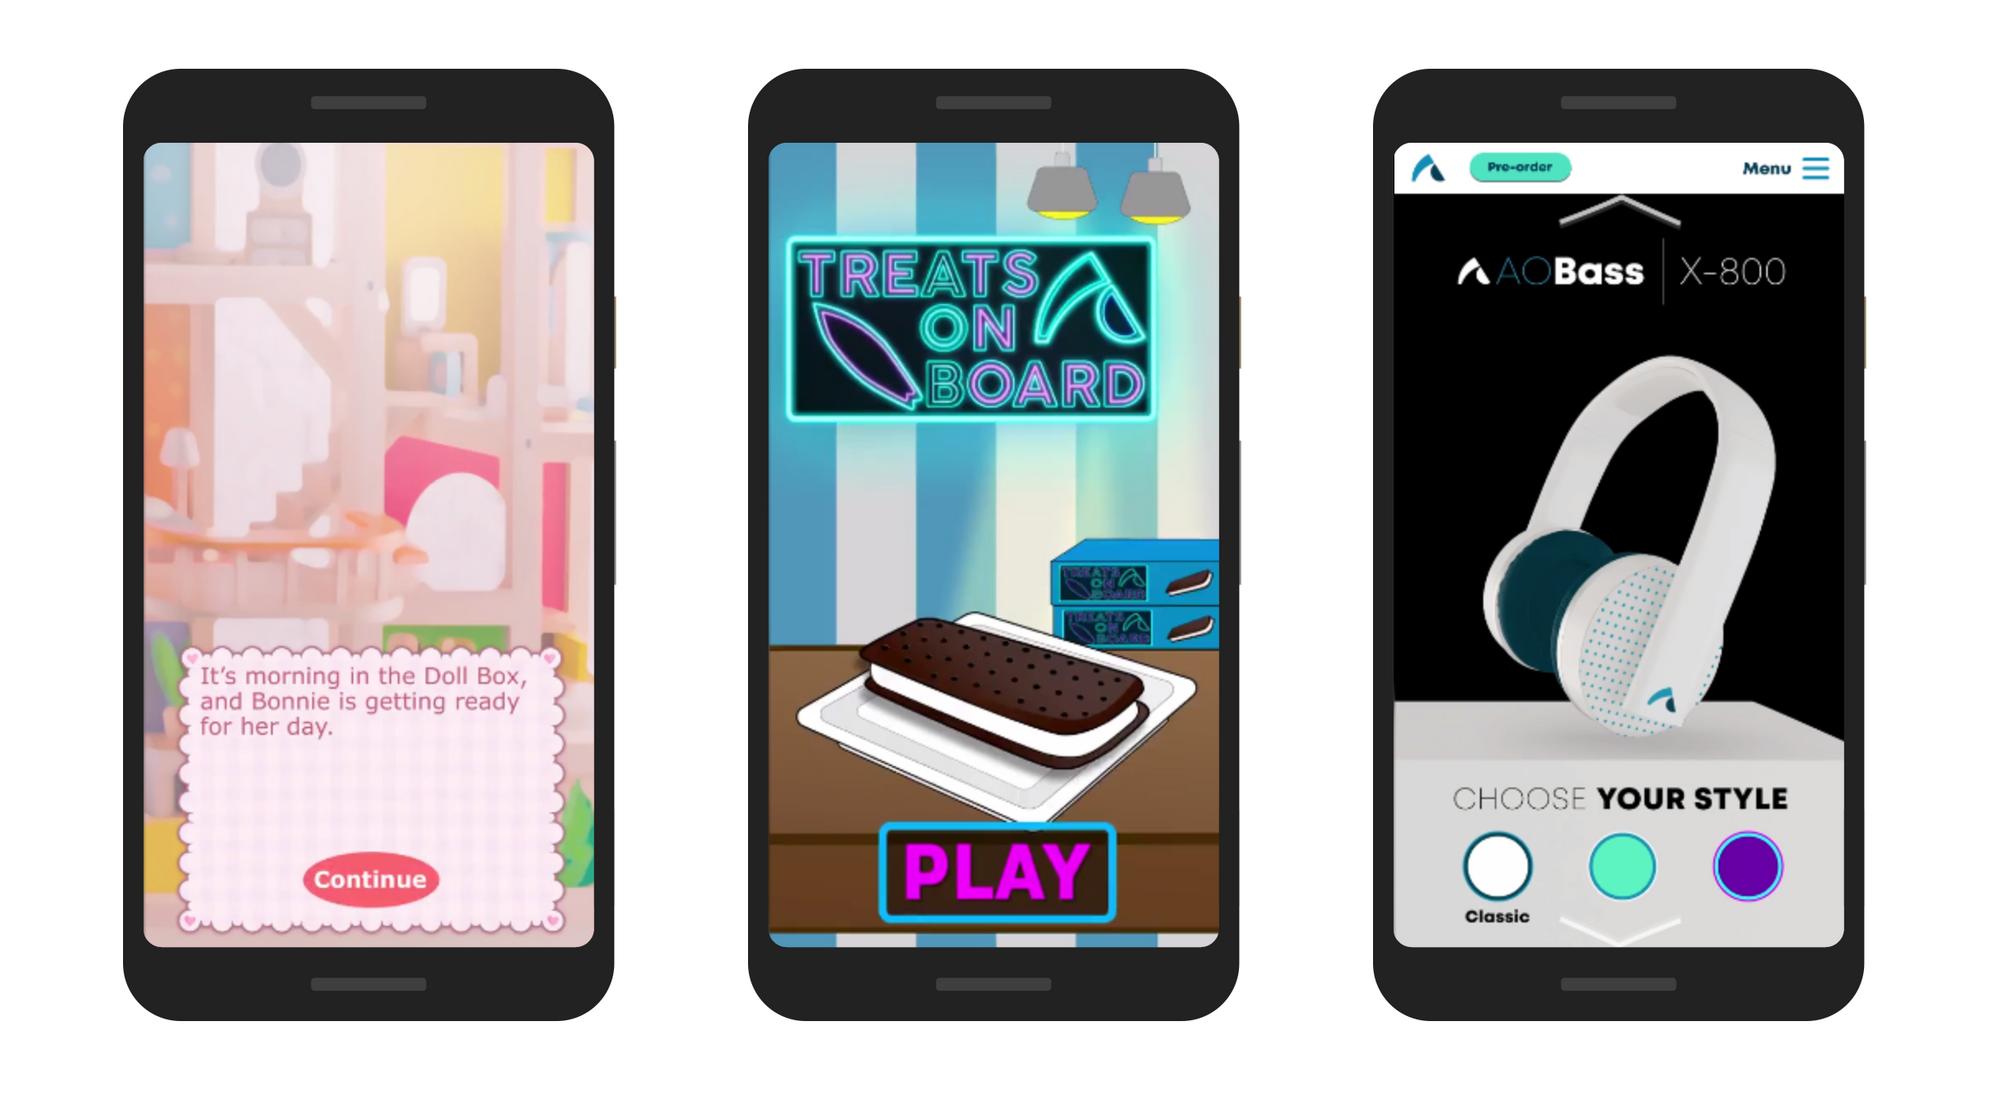 AppOnboard Studio's interactive ads